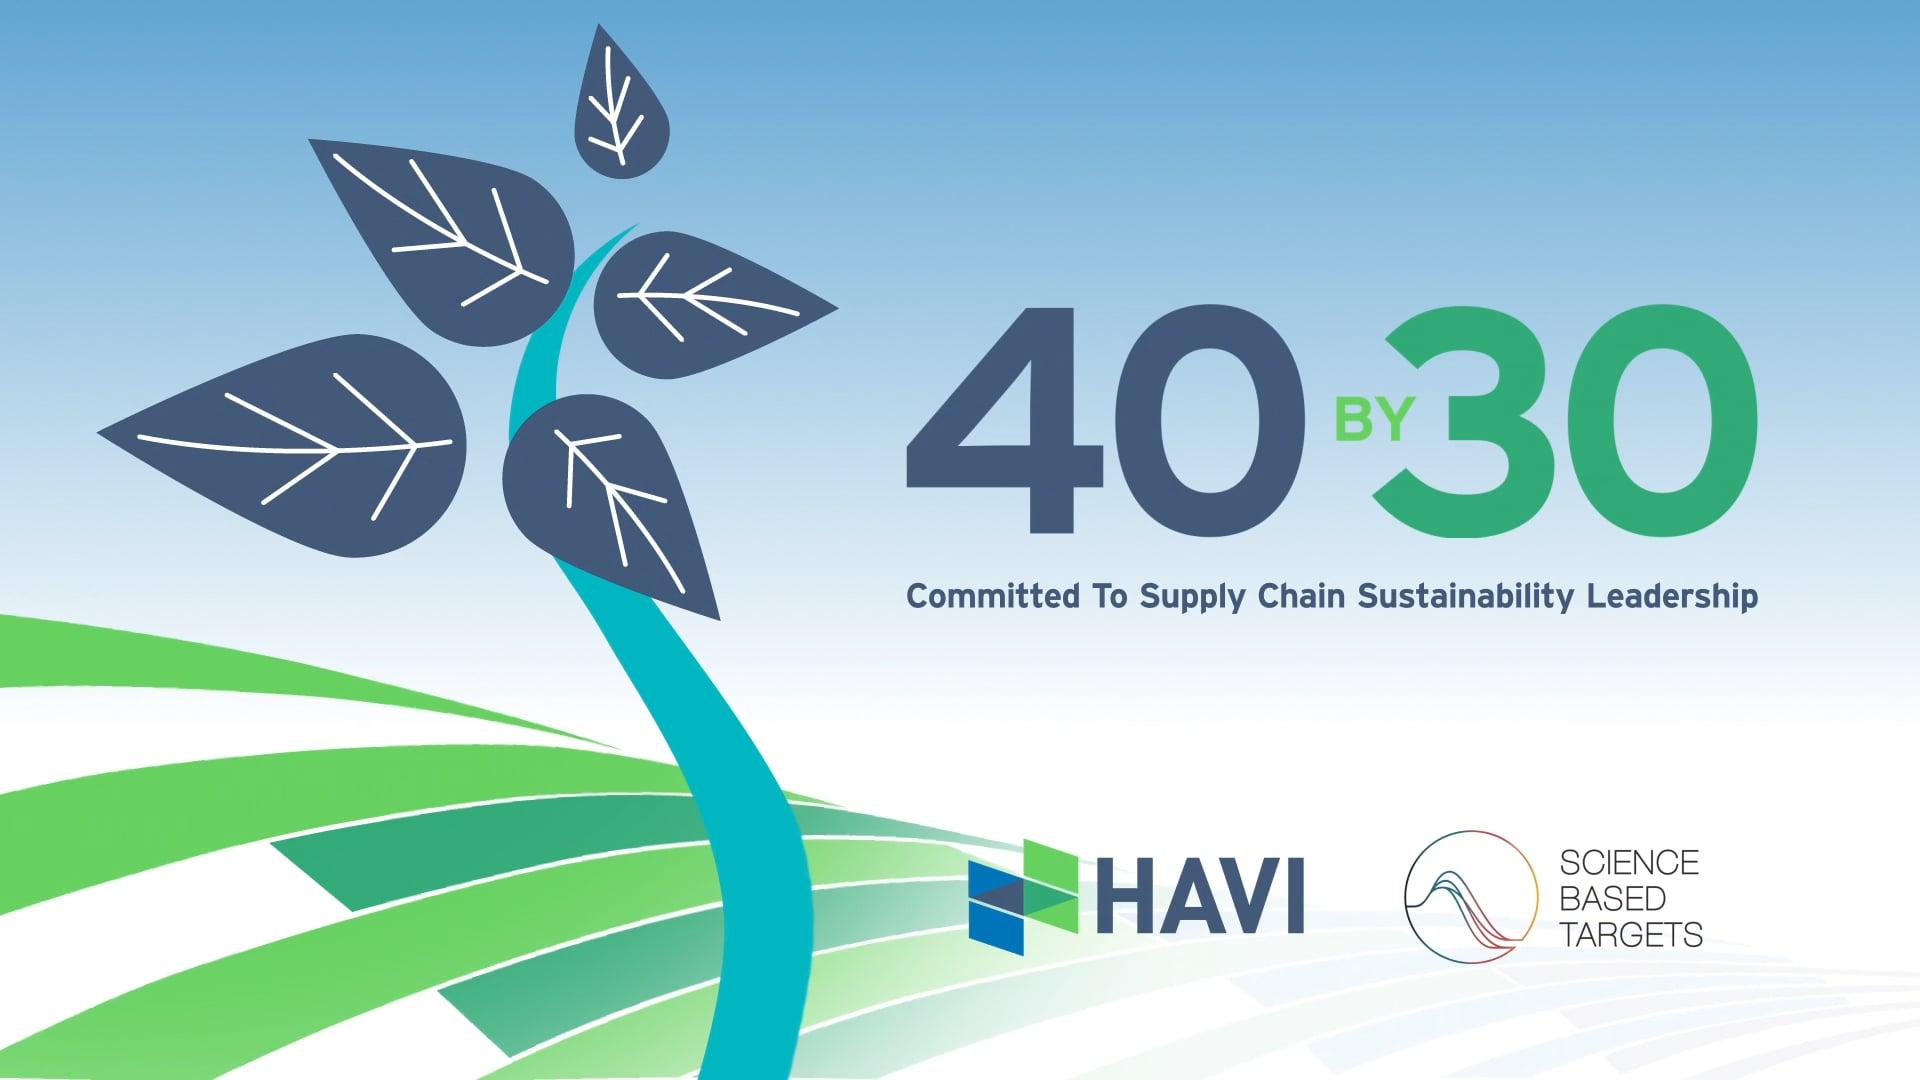 Introducing HAVI's Science Based Target